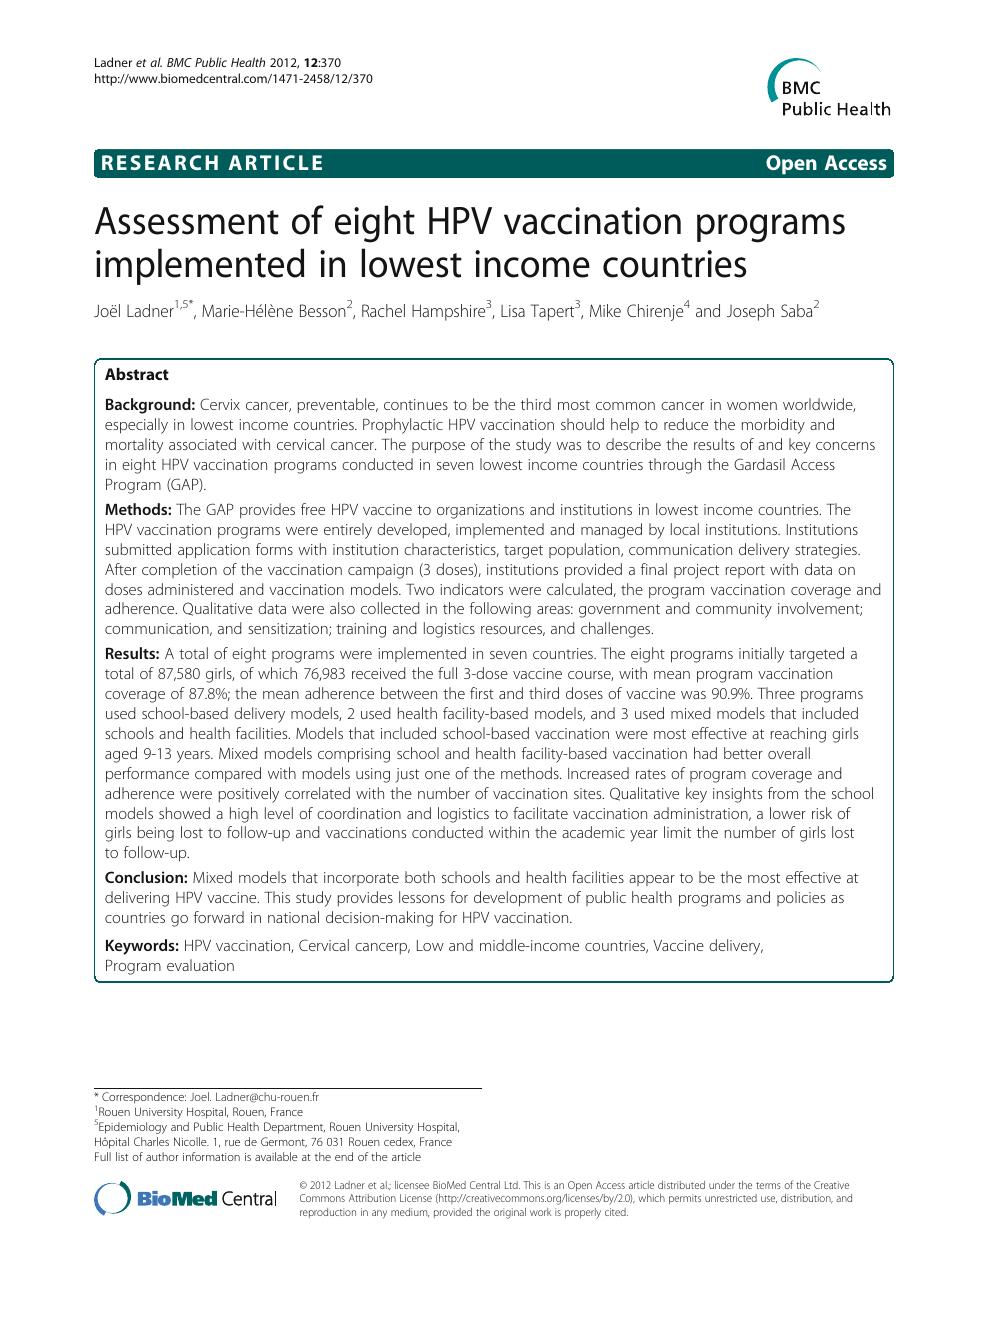 human papillomavirus vaccine in nepal)